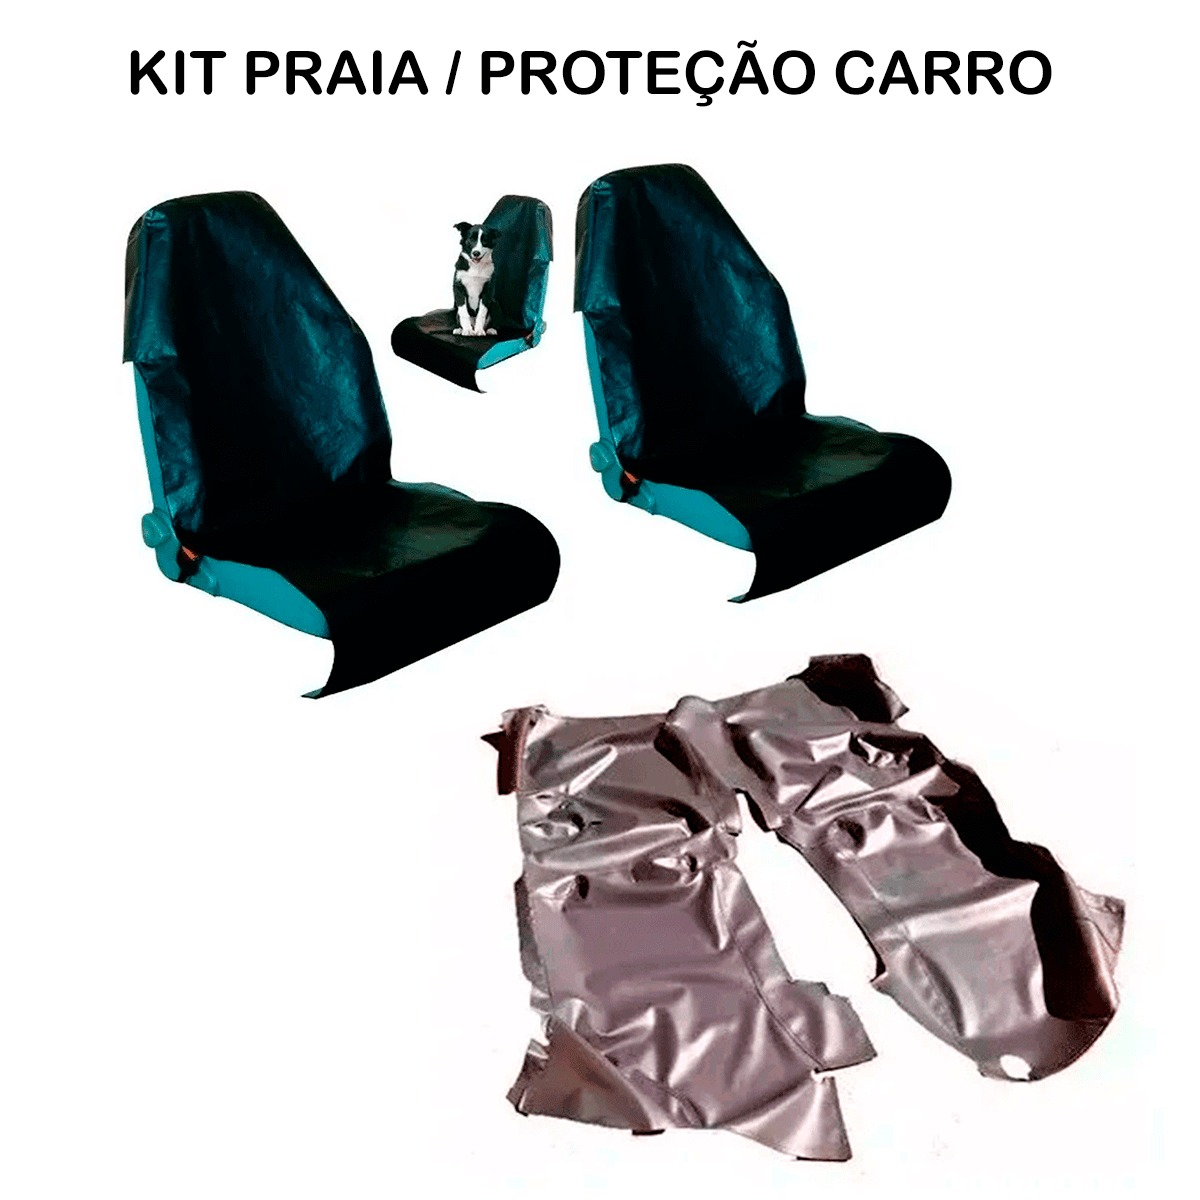 Tapete Em Vinil Fiat Fiorino 2007 a 2013 + Capa Banco Protecao Banco Areia Suor Academia